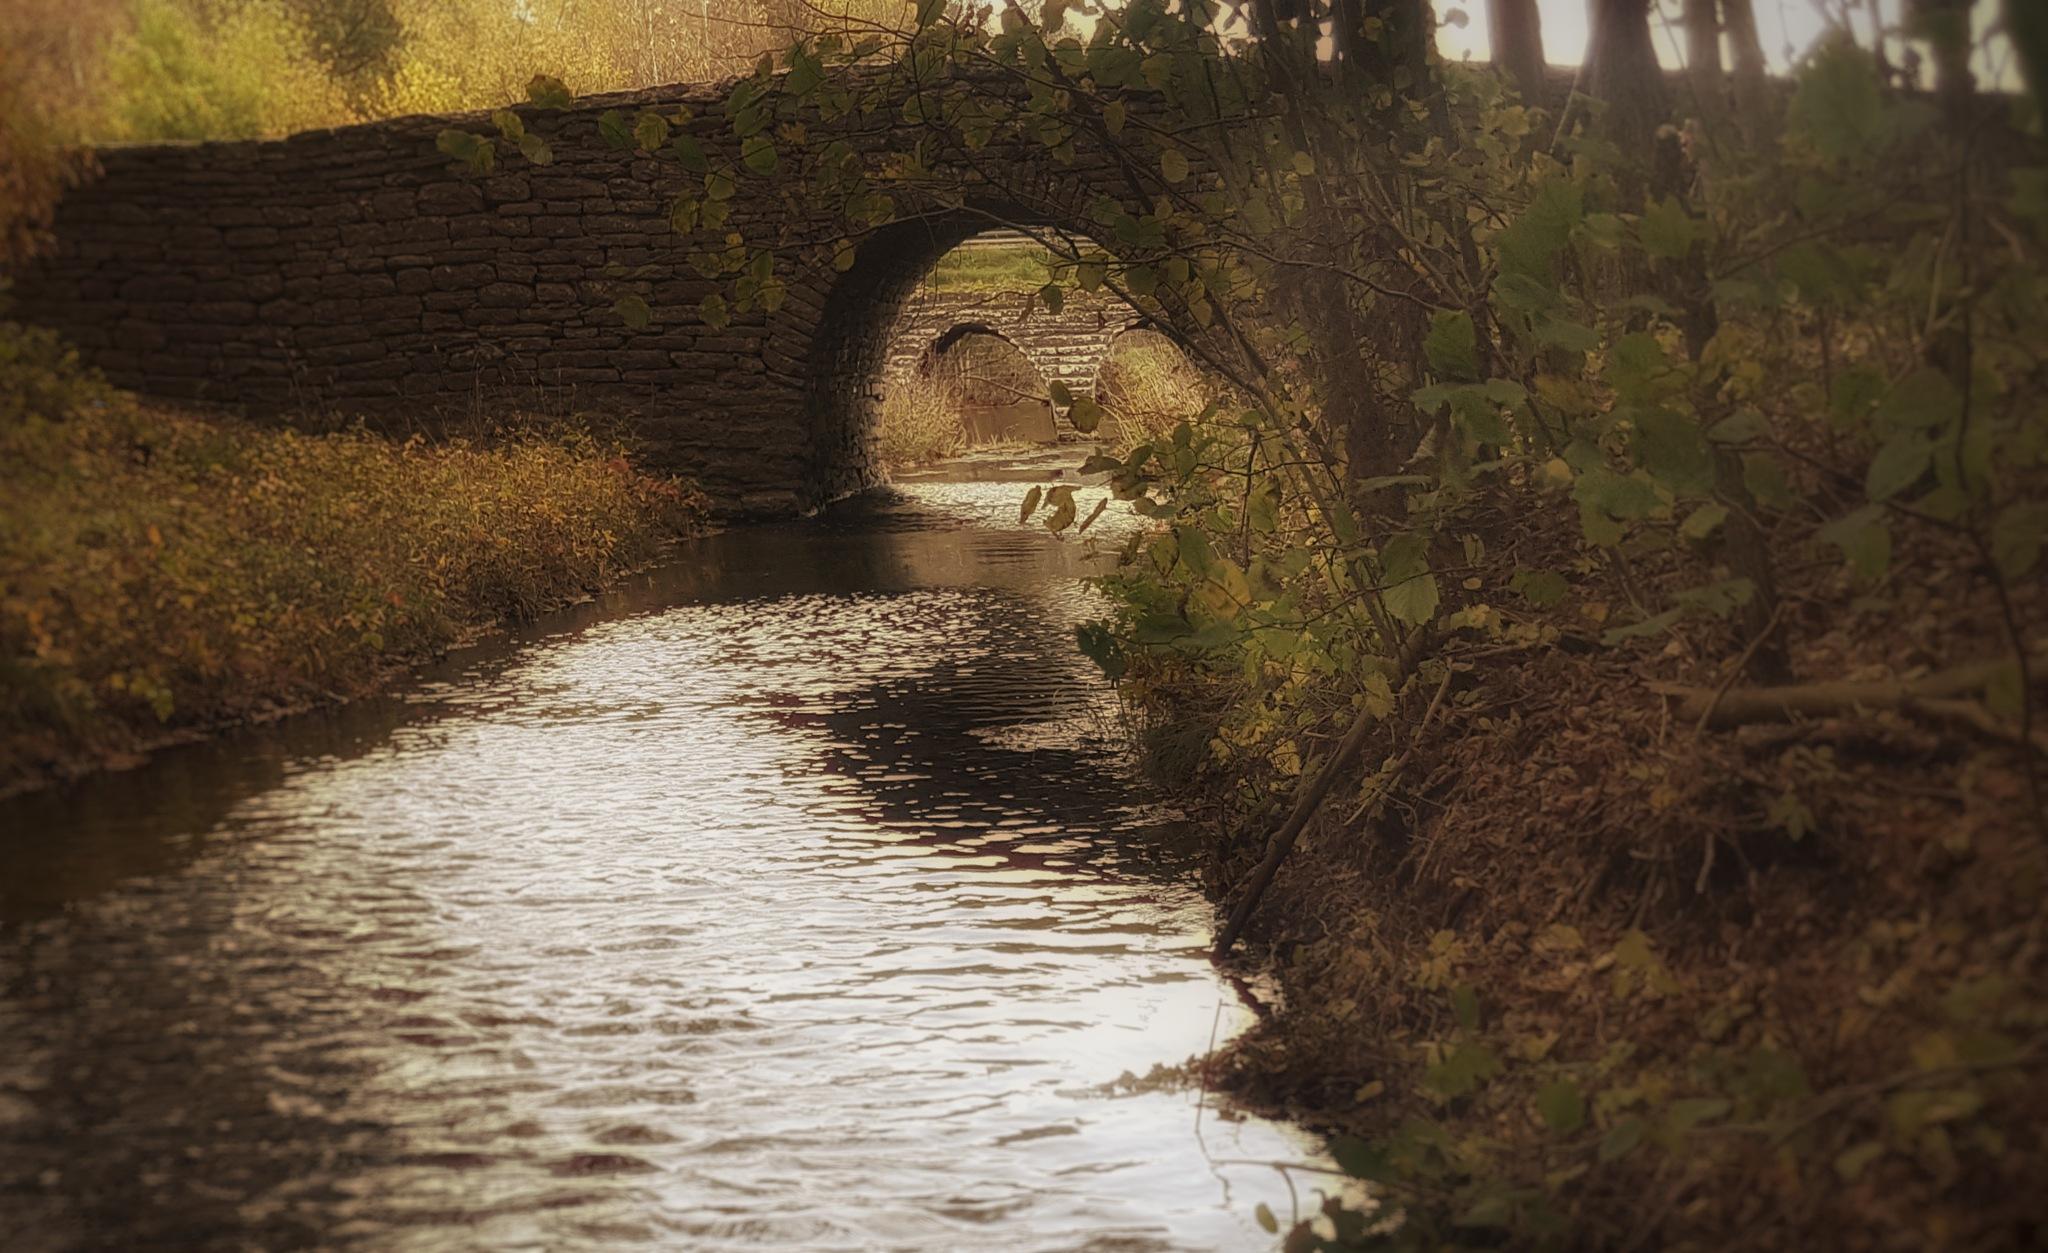 Bridge by Annica Josefsson